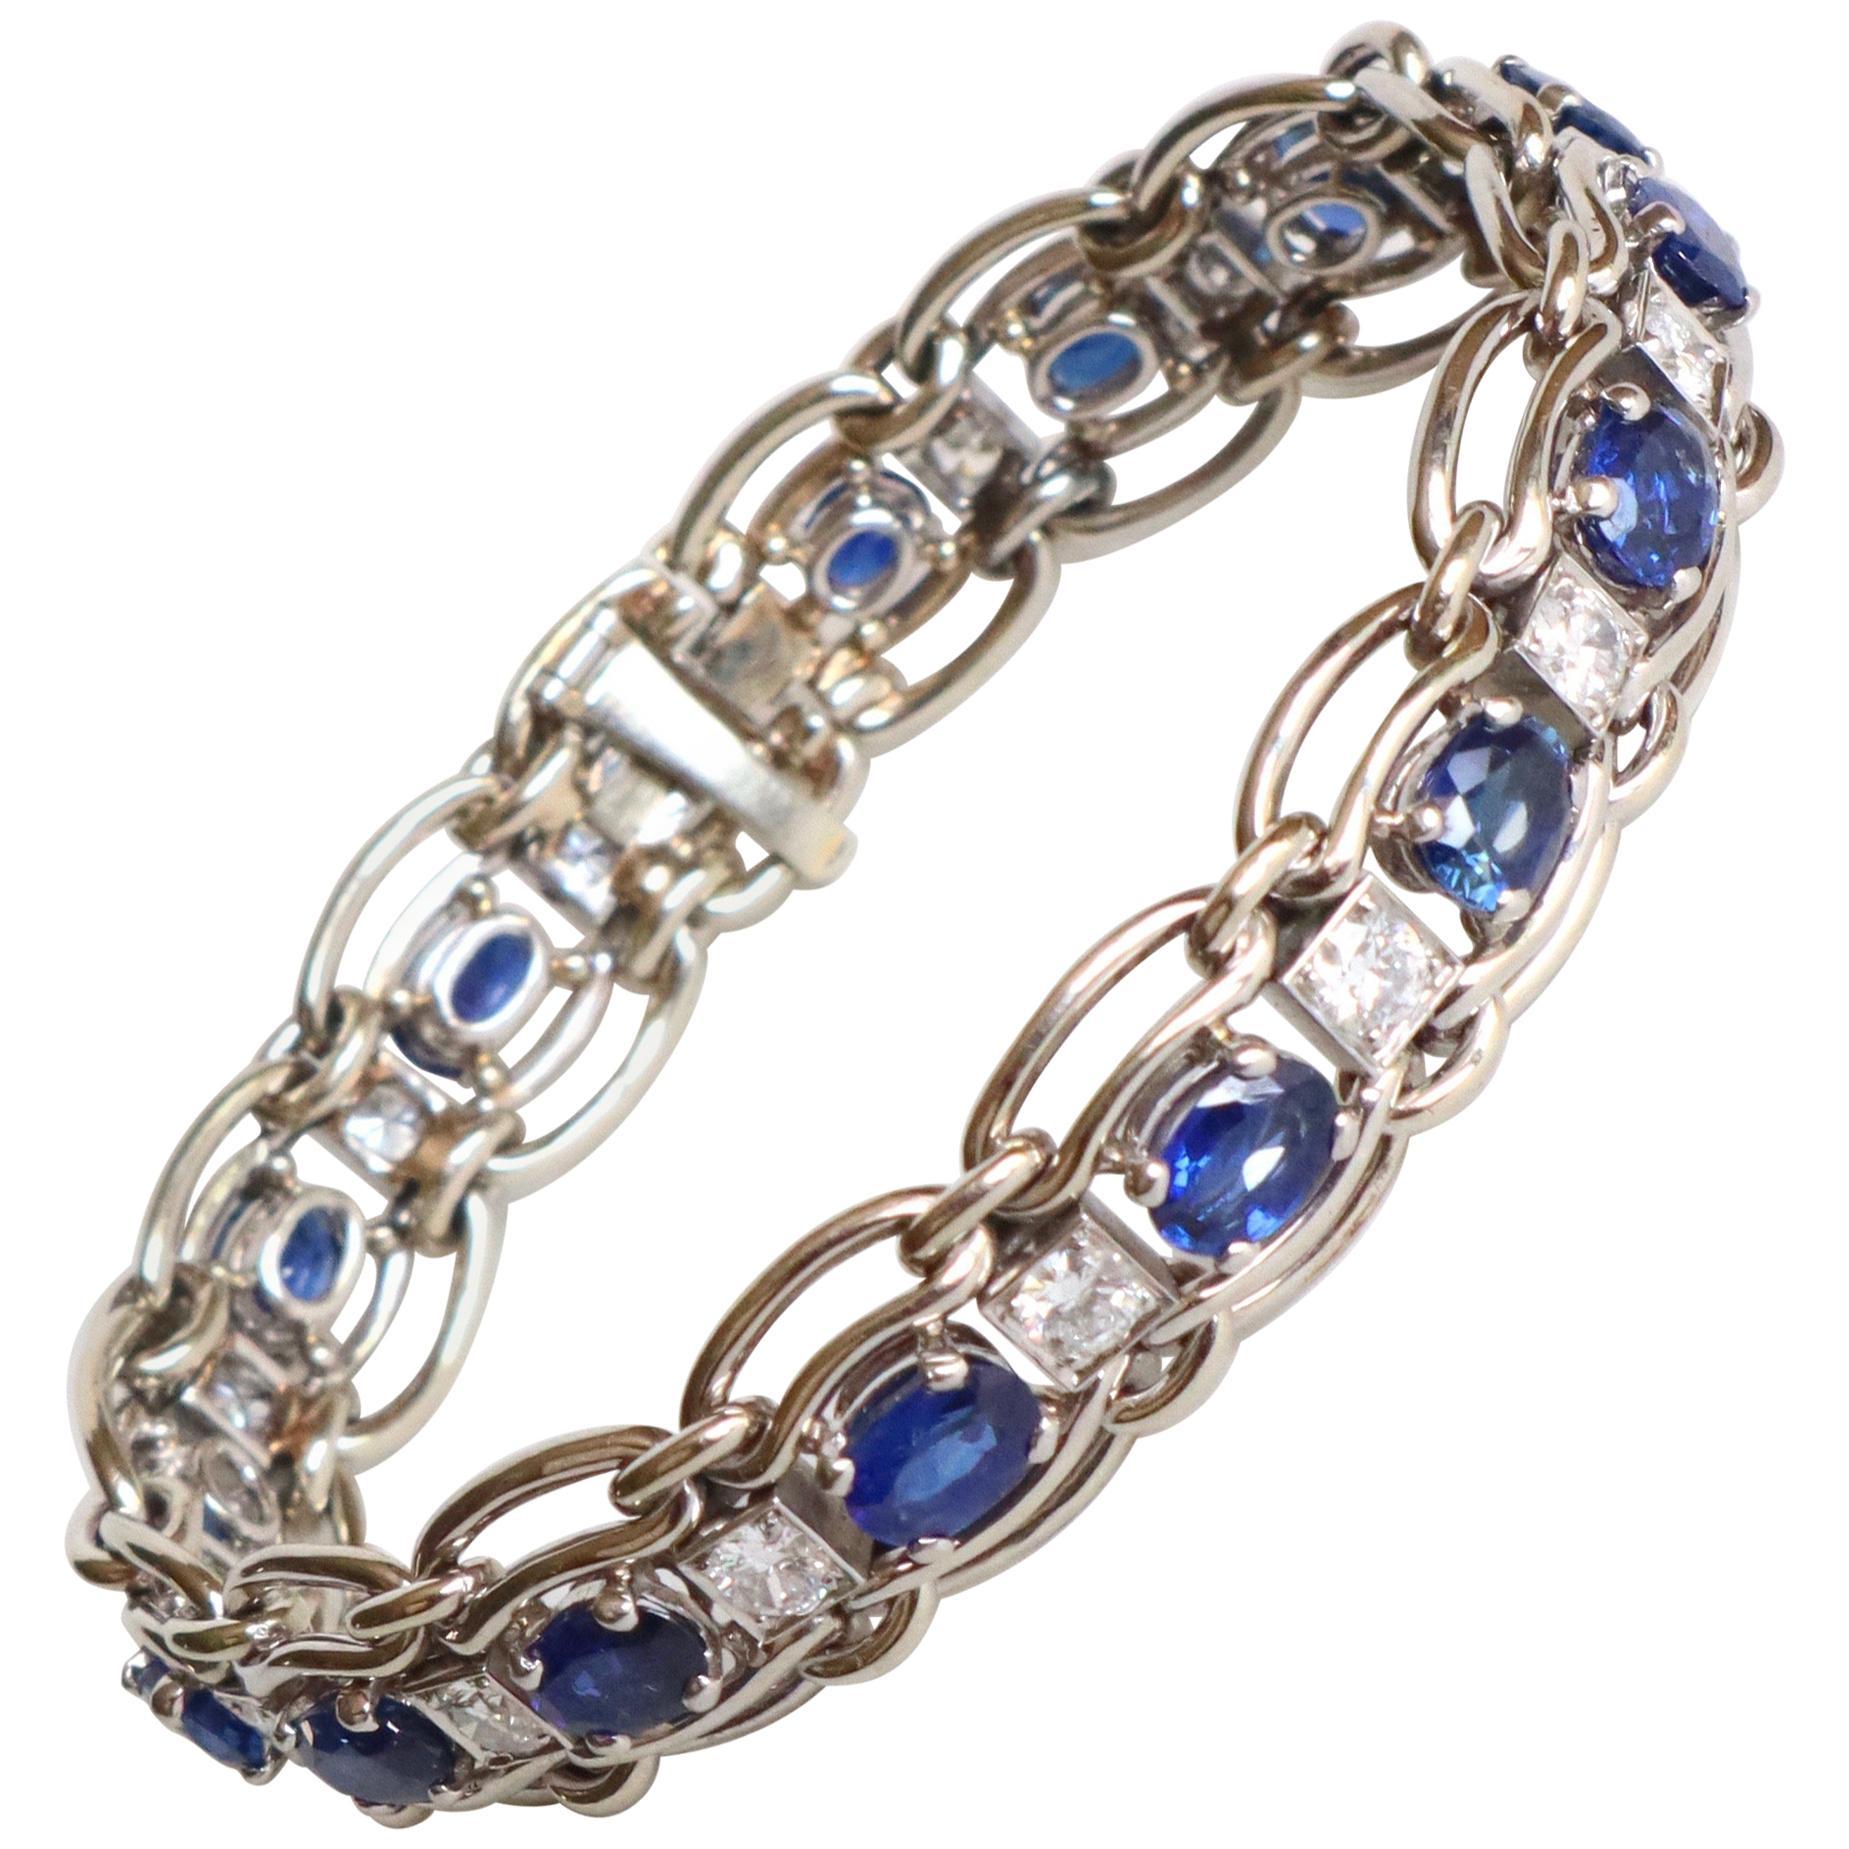 Mauboussin White Gold Bracelet, Sapphires and Diamonds